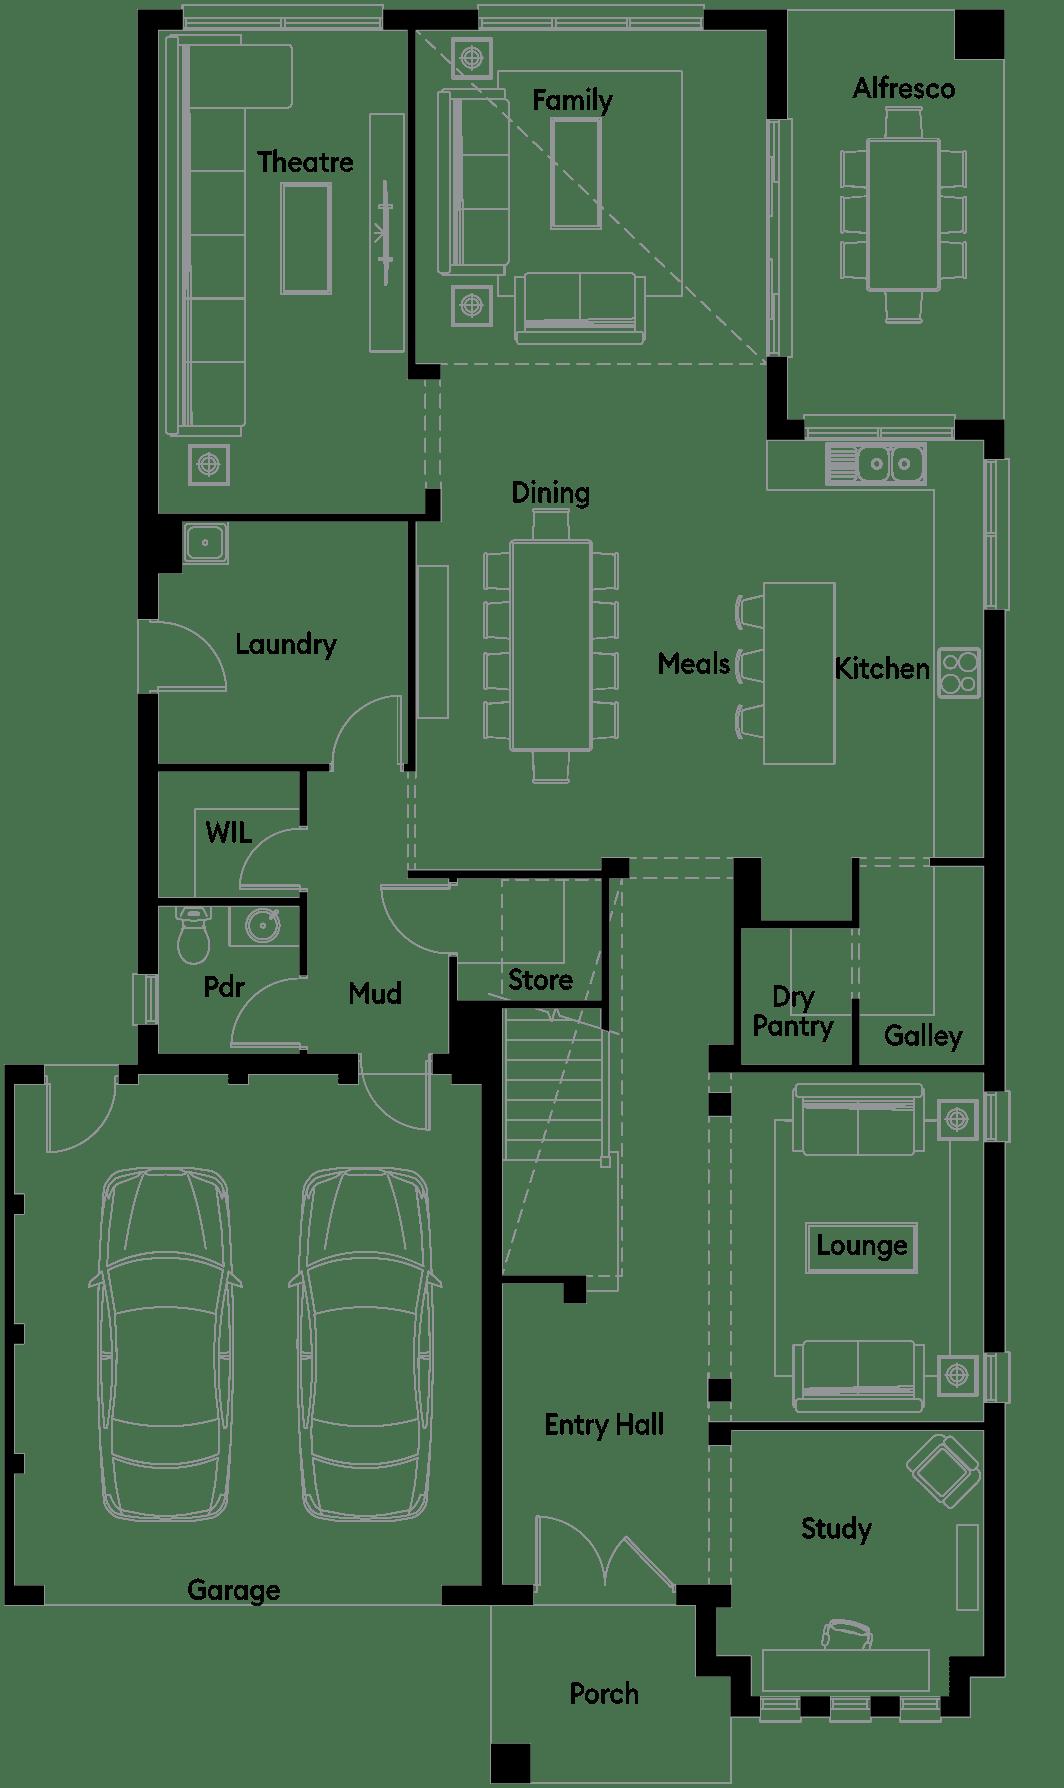 FloorPlan1_HOUSE726_Astor_43L-01